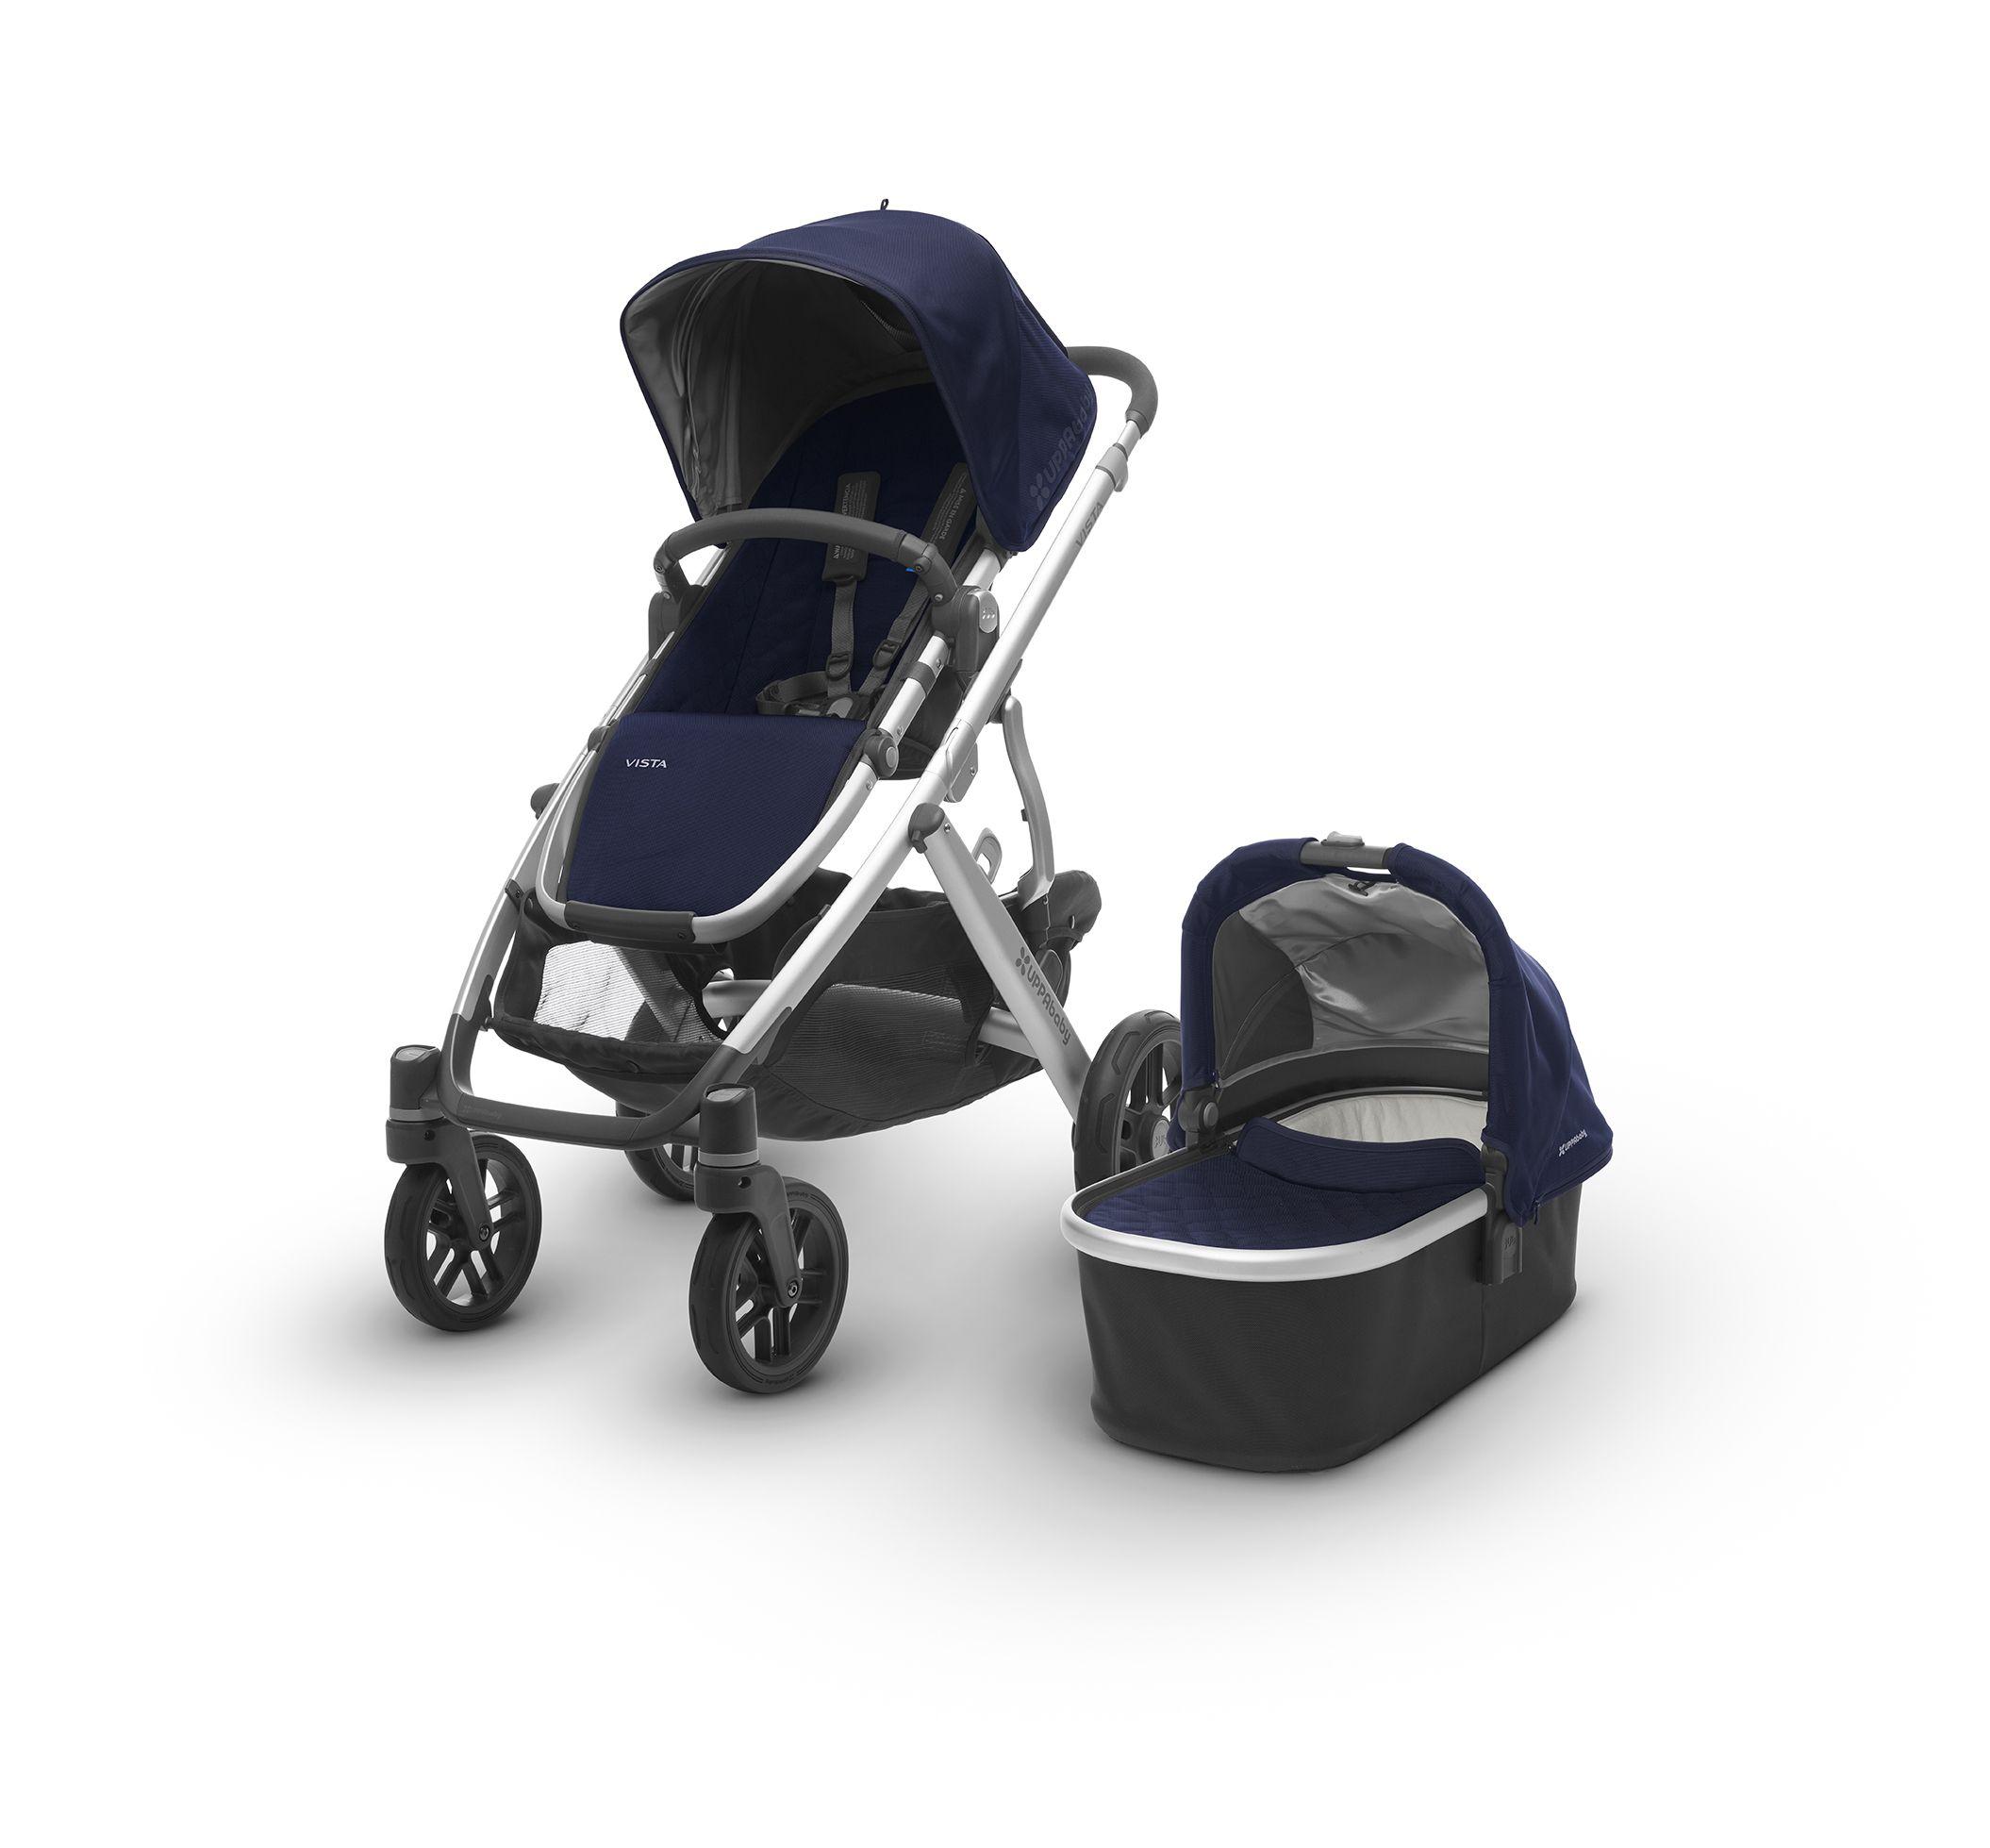 VISTA V2 Best baby strollers, Vista stroller, Uppababy